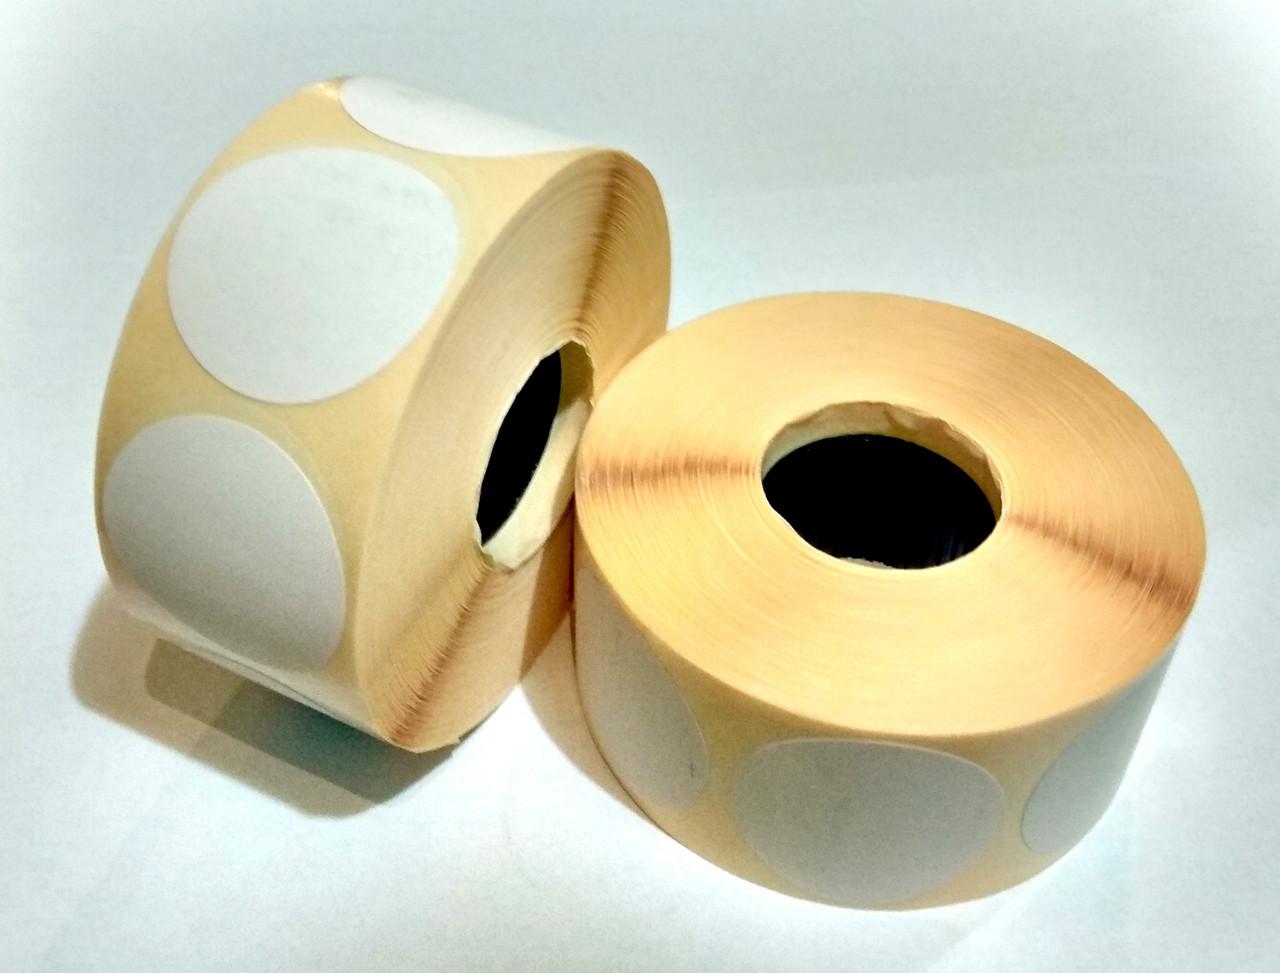 Mobitehnika Термоетикетка для етикеточних принтерів Т. еко коло 30 1000шт